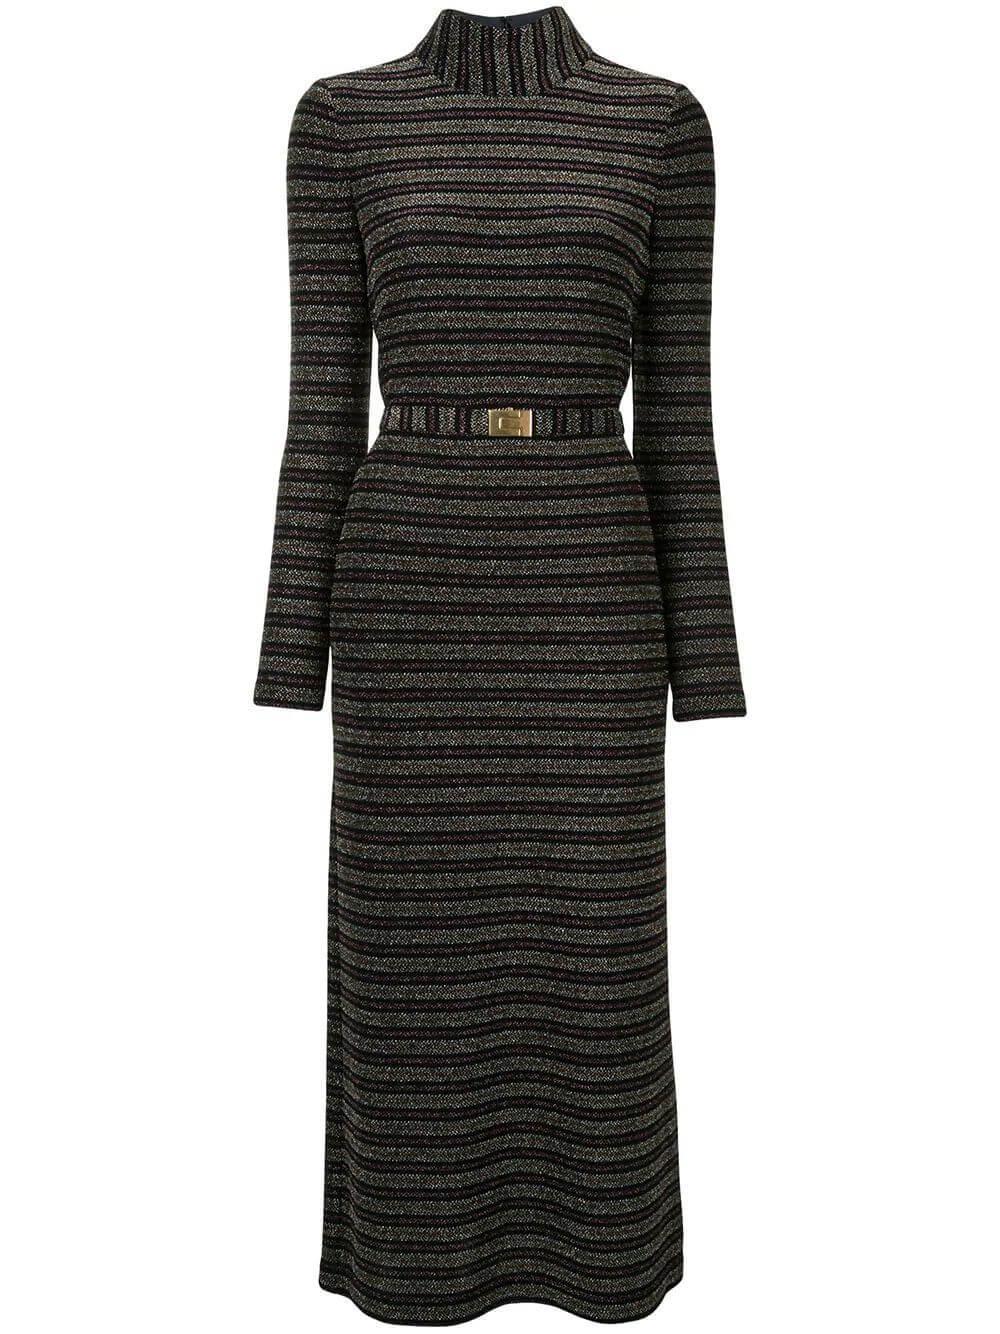 Striped Mock Neck Dress Item # 76357-803